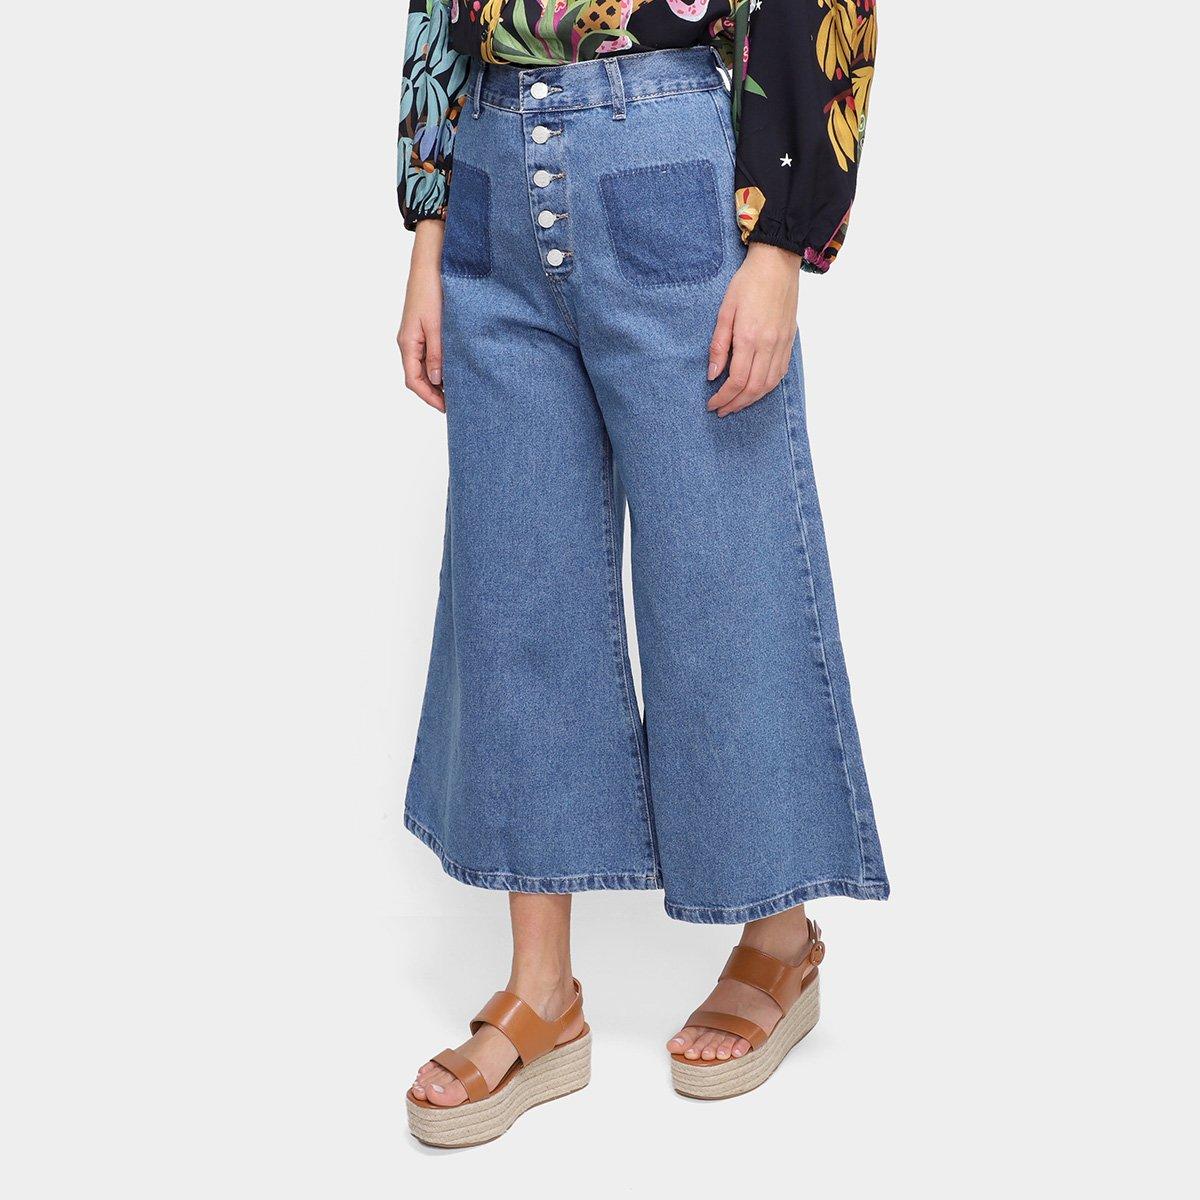 Calça Jeans Farm Refarm Cintura Alta Feminina